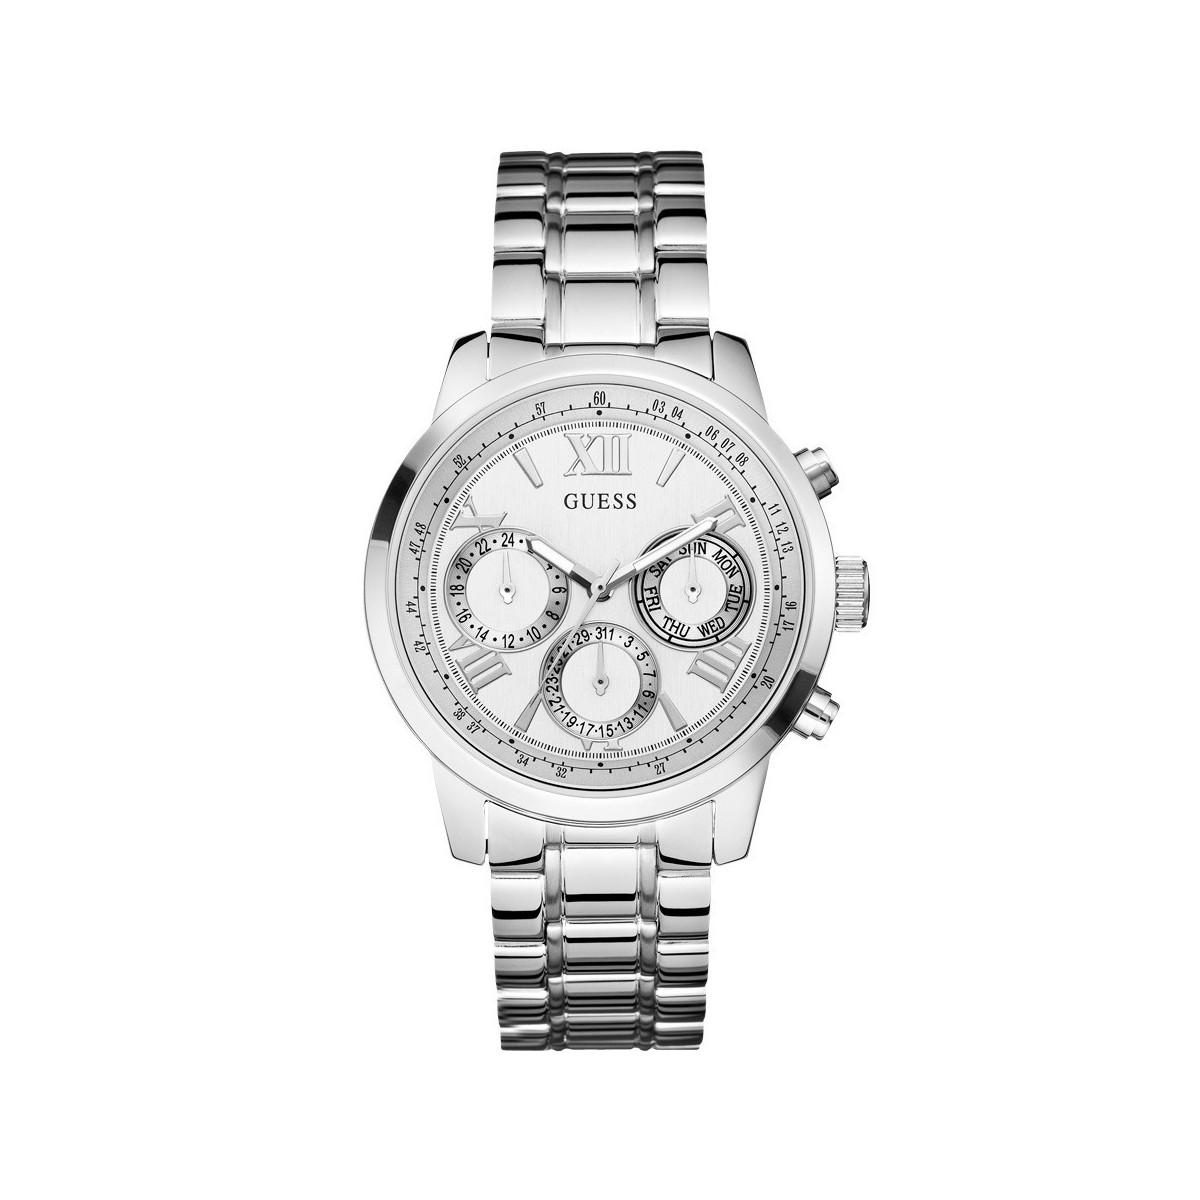 https://www.gaberjoyeria.com/3368-thickbox_default/reloj-guess-w0330l3.jpg